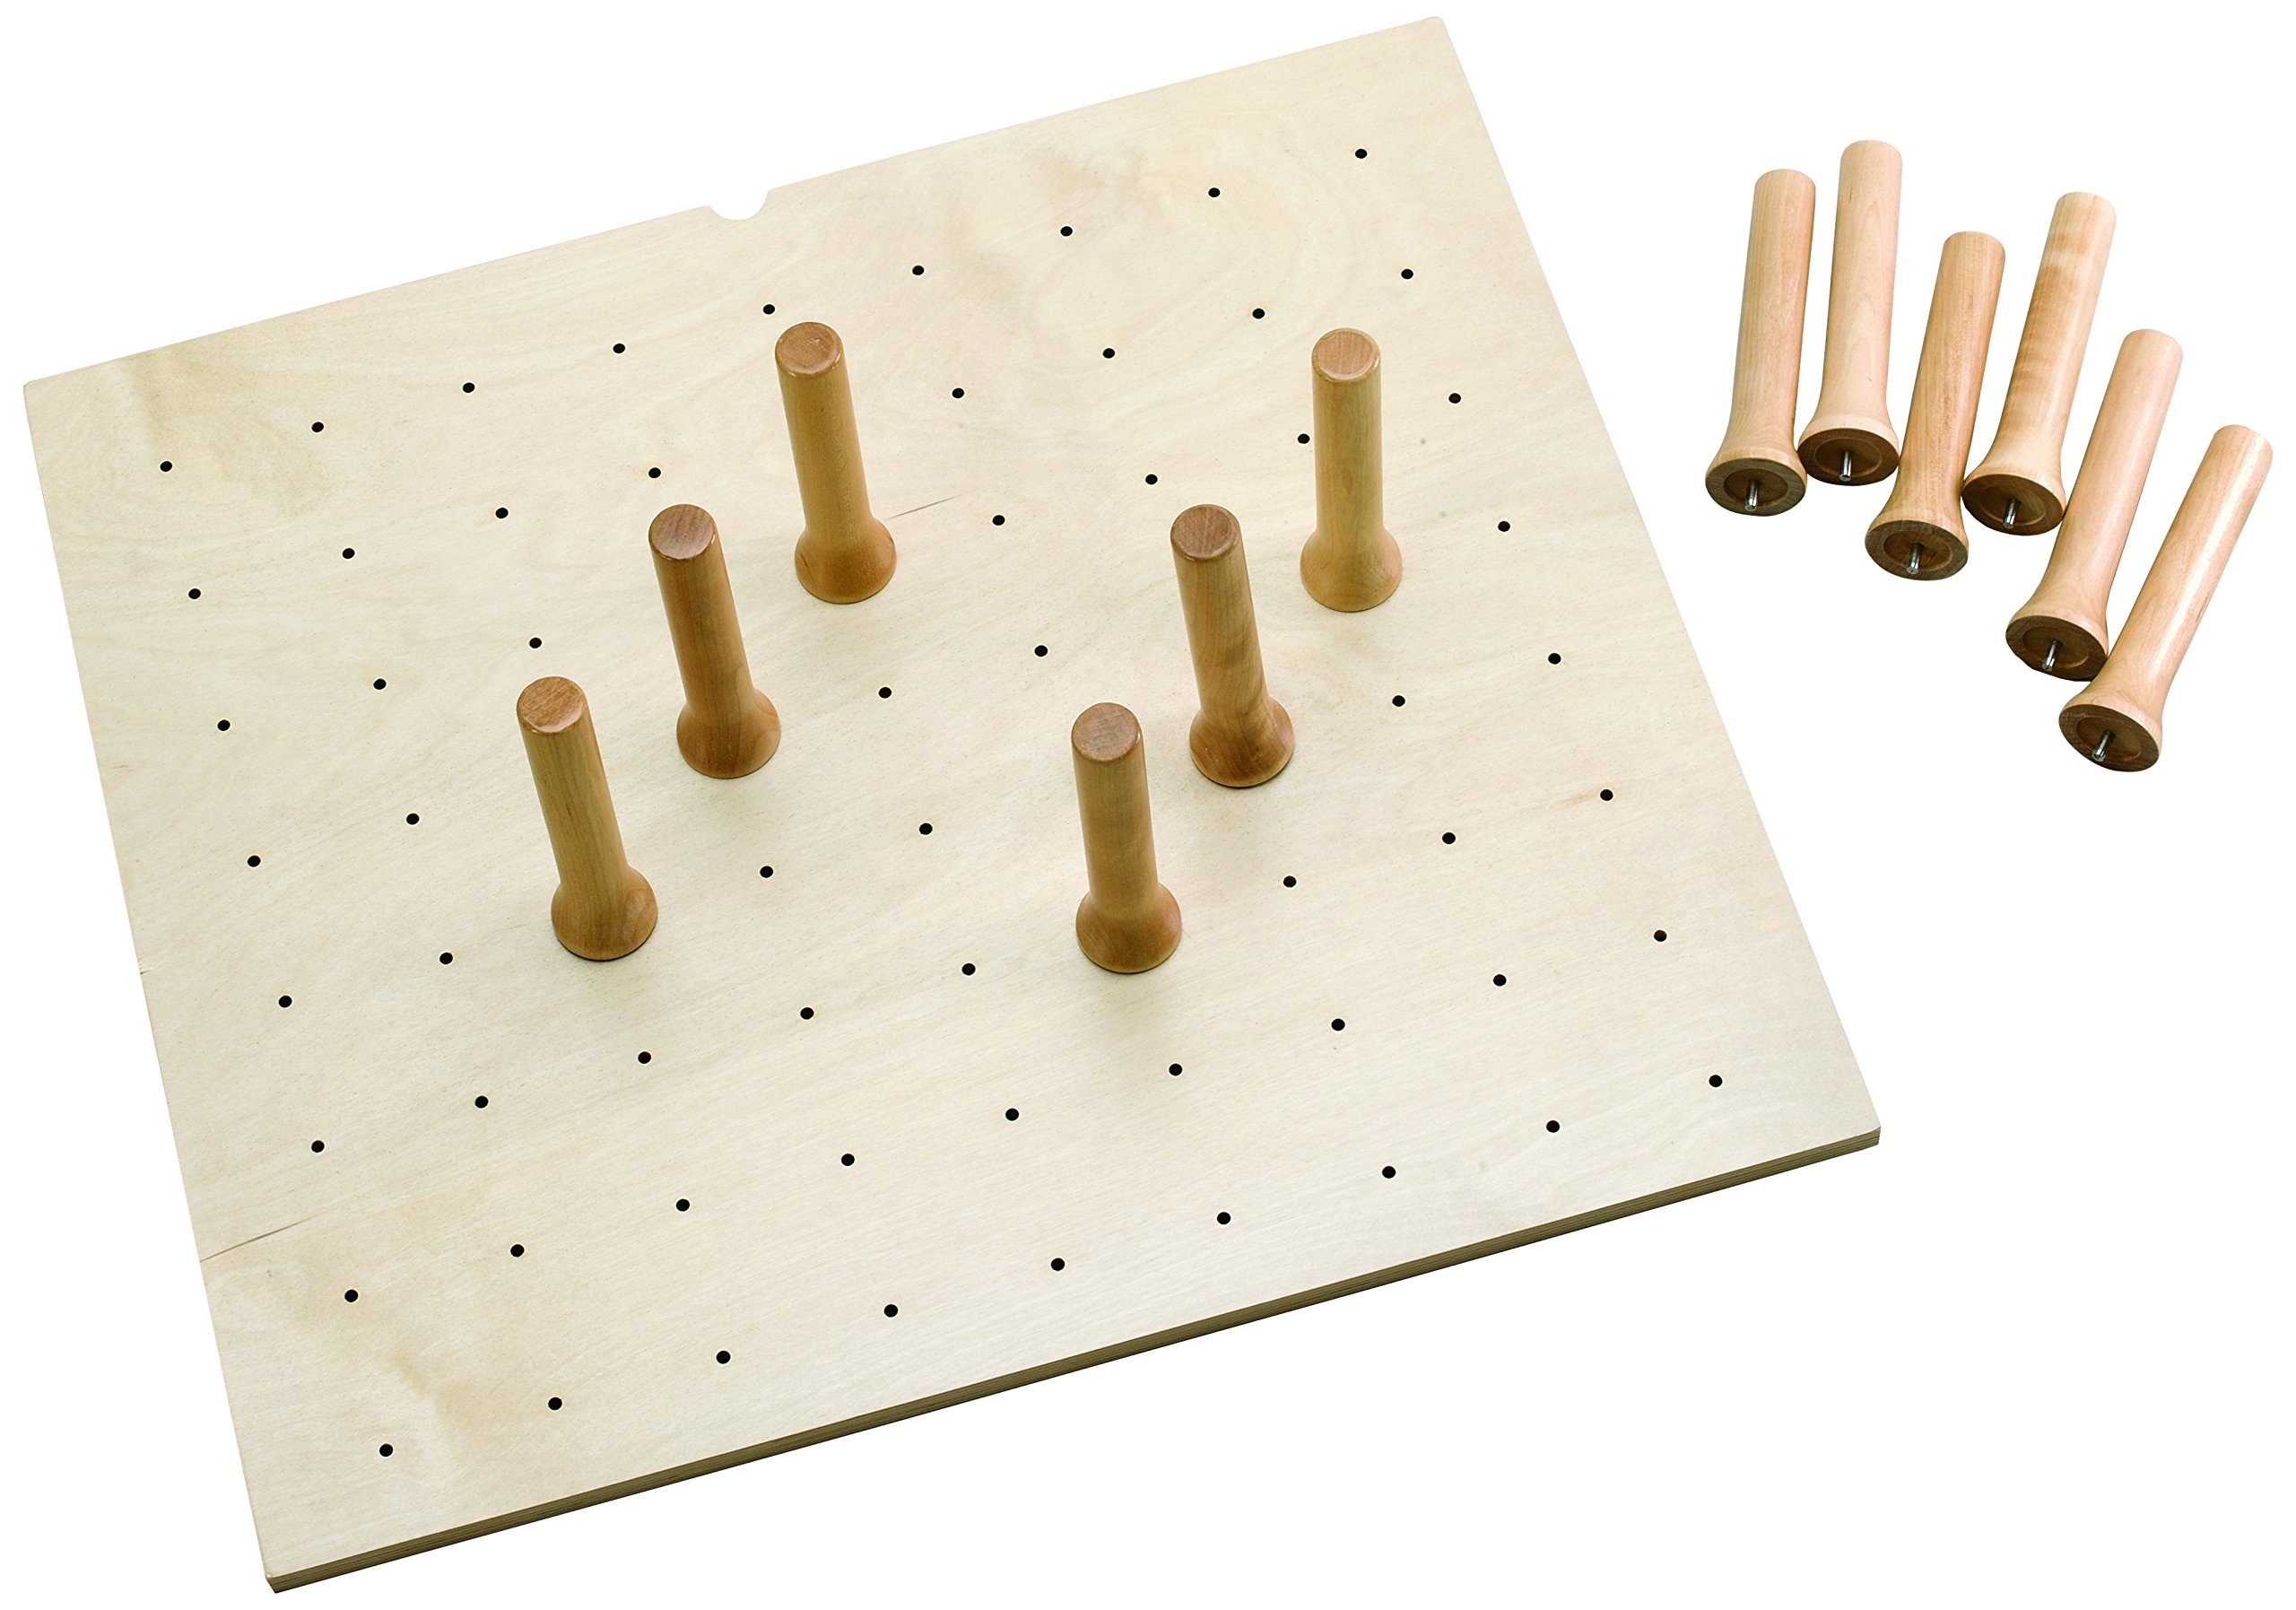 Rev-A-Shelf 24 x 21 Wood Peg Board Drawer Organizers, Natural